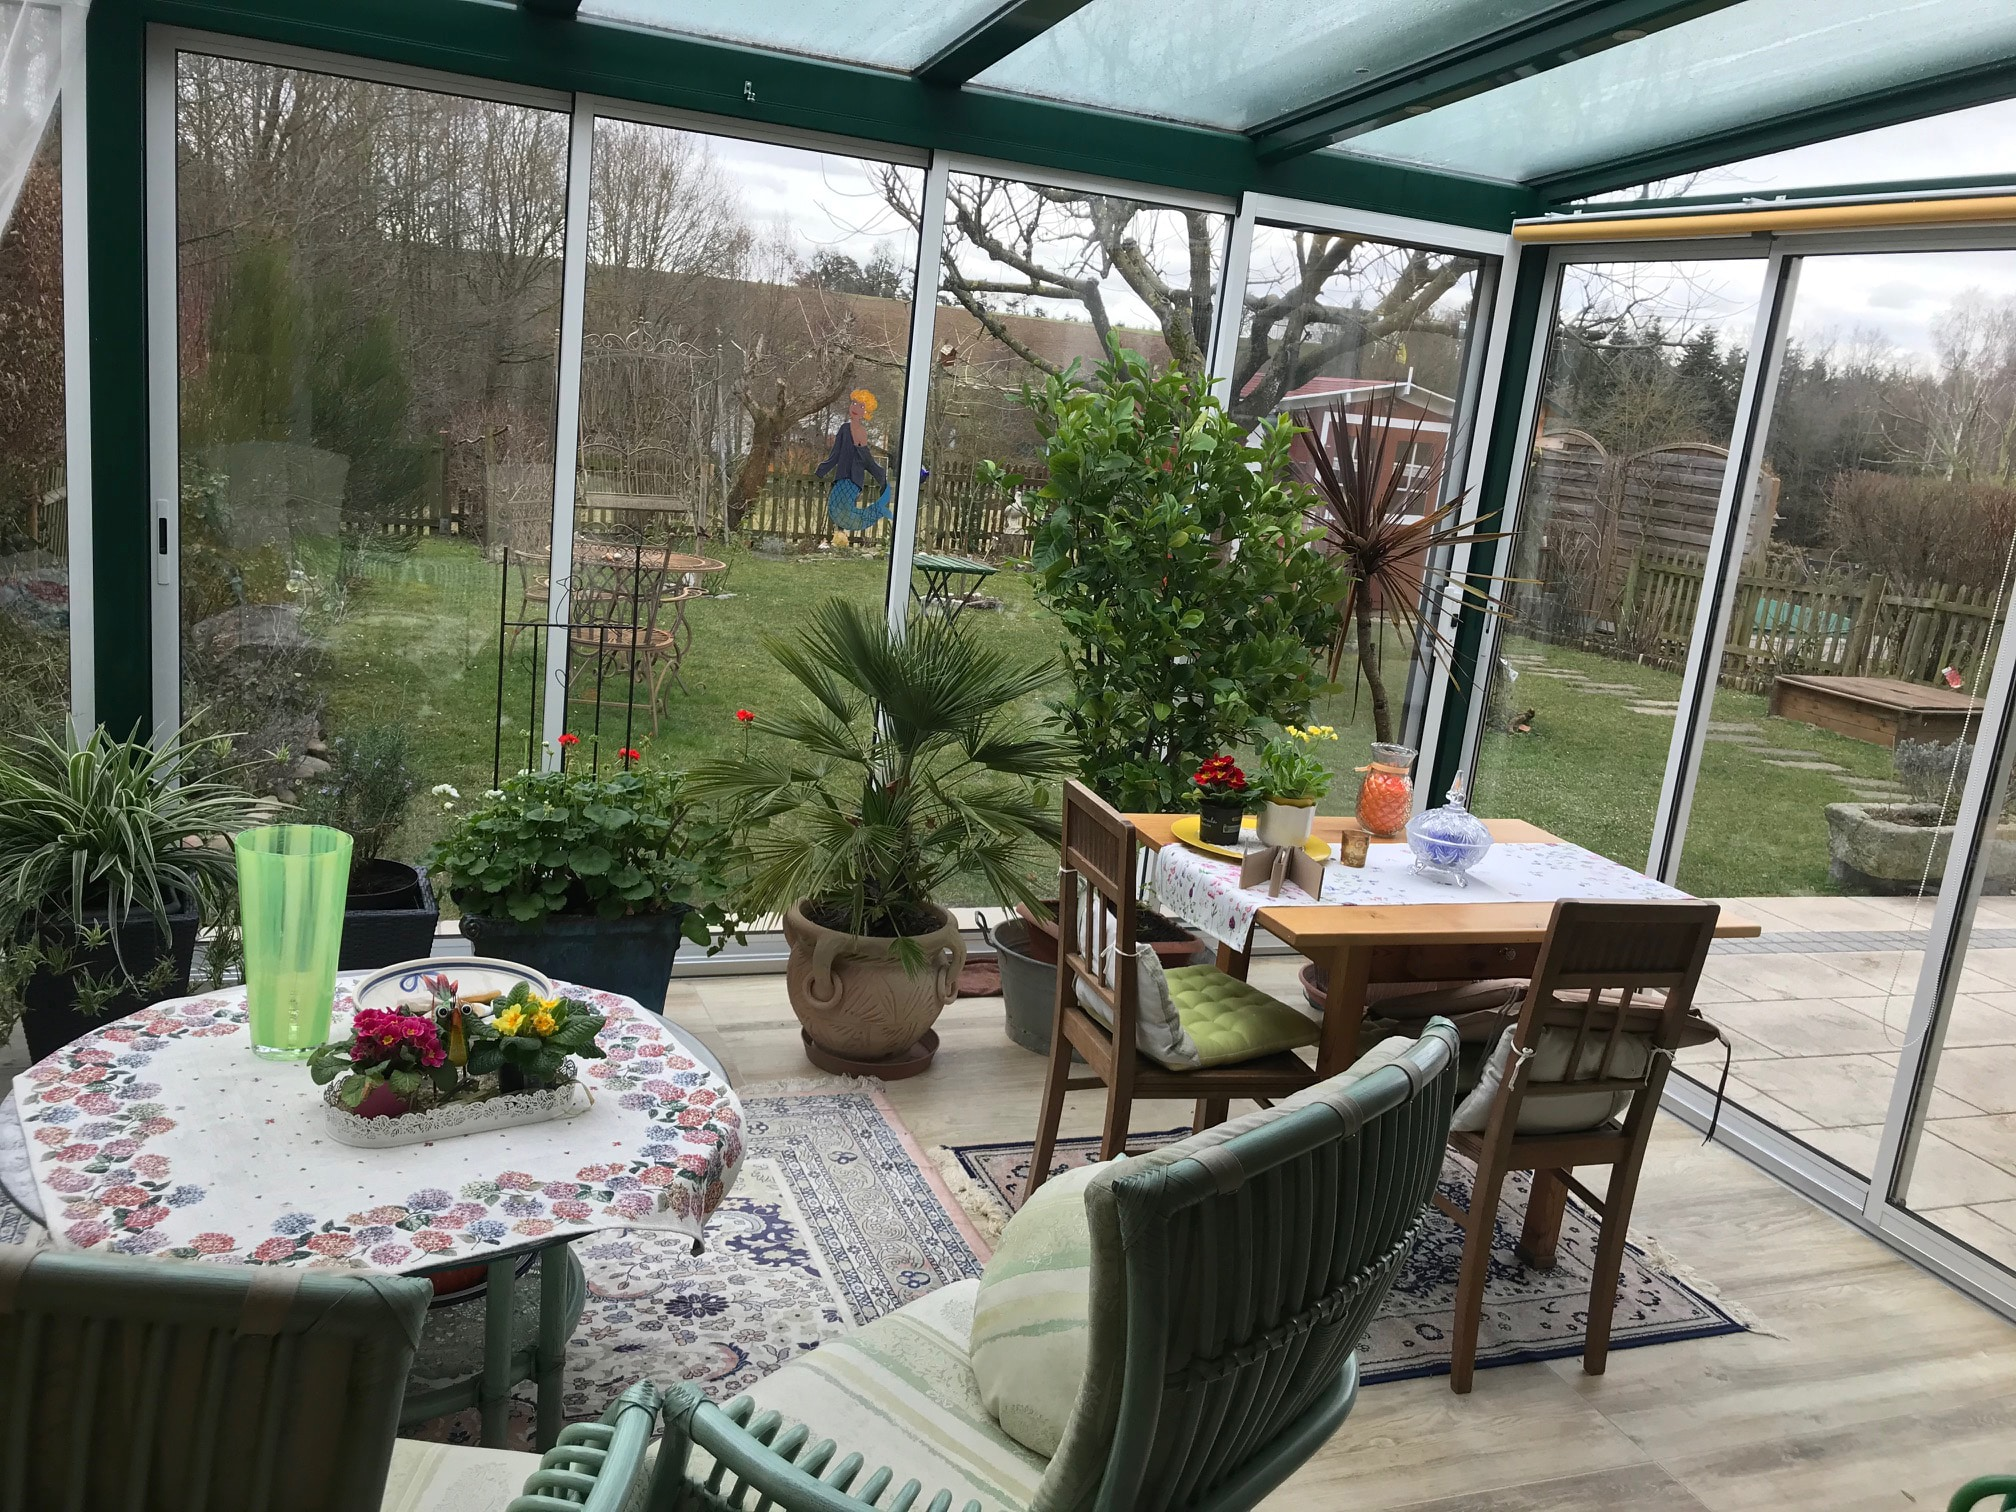 Sommergarten Bilder - Kaltes System